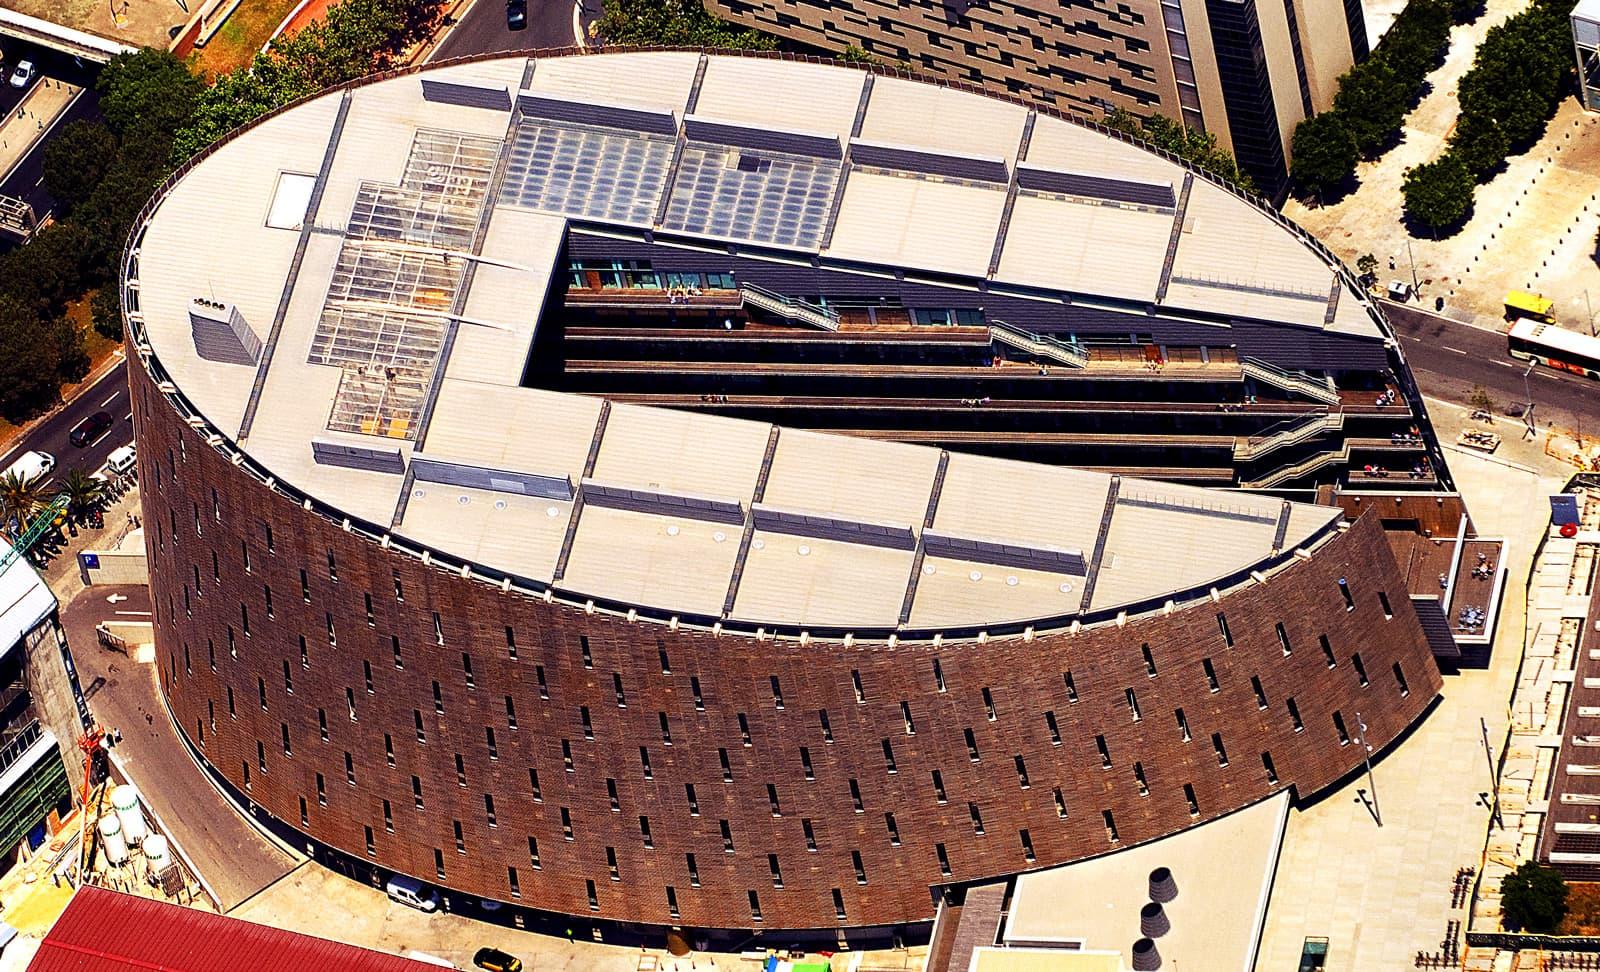 Vista aèria del Parc de Recerca Biomèdica de Barcelona. Fotografia de Xavier Jubierre